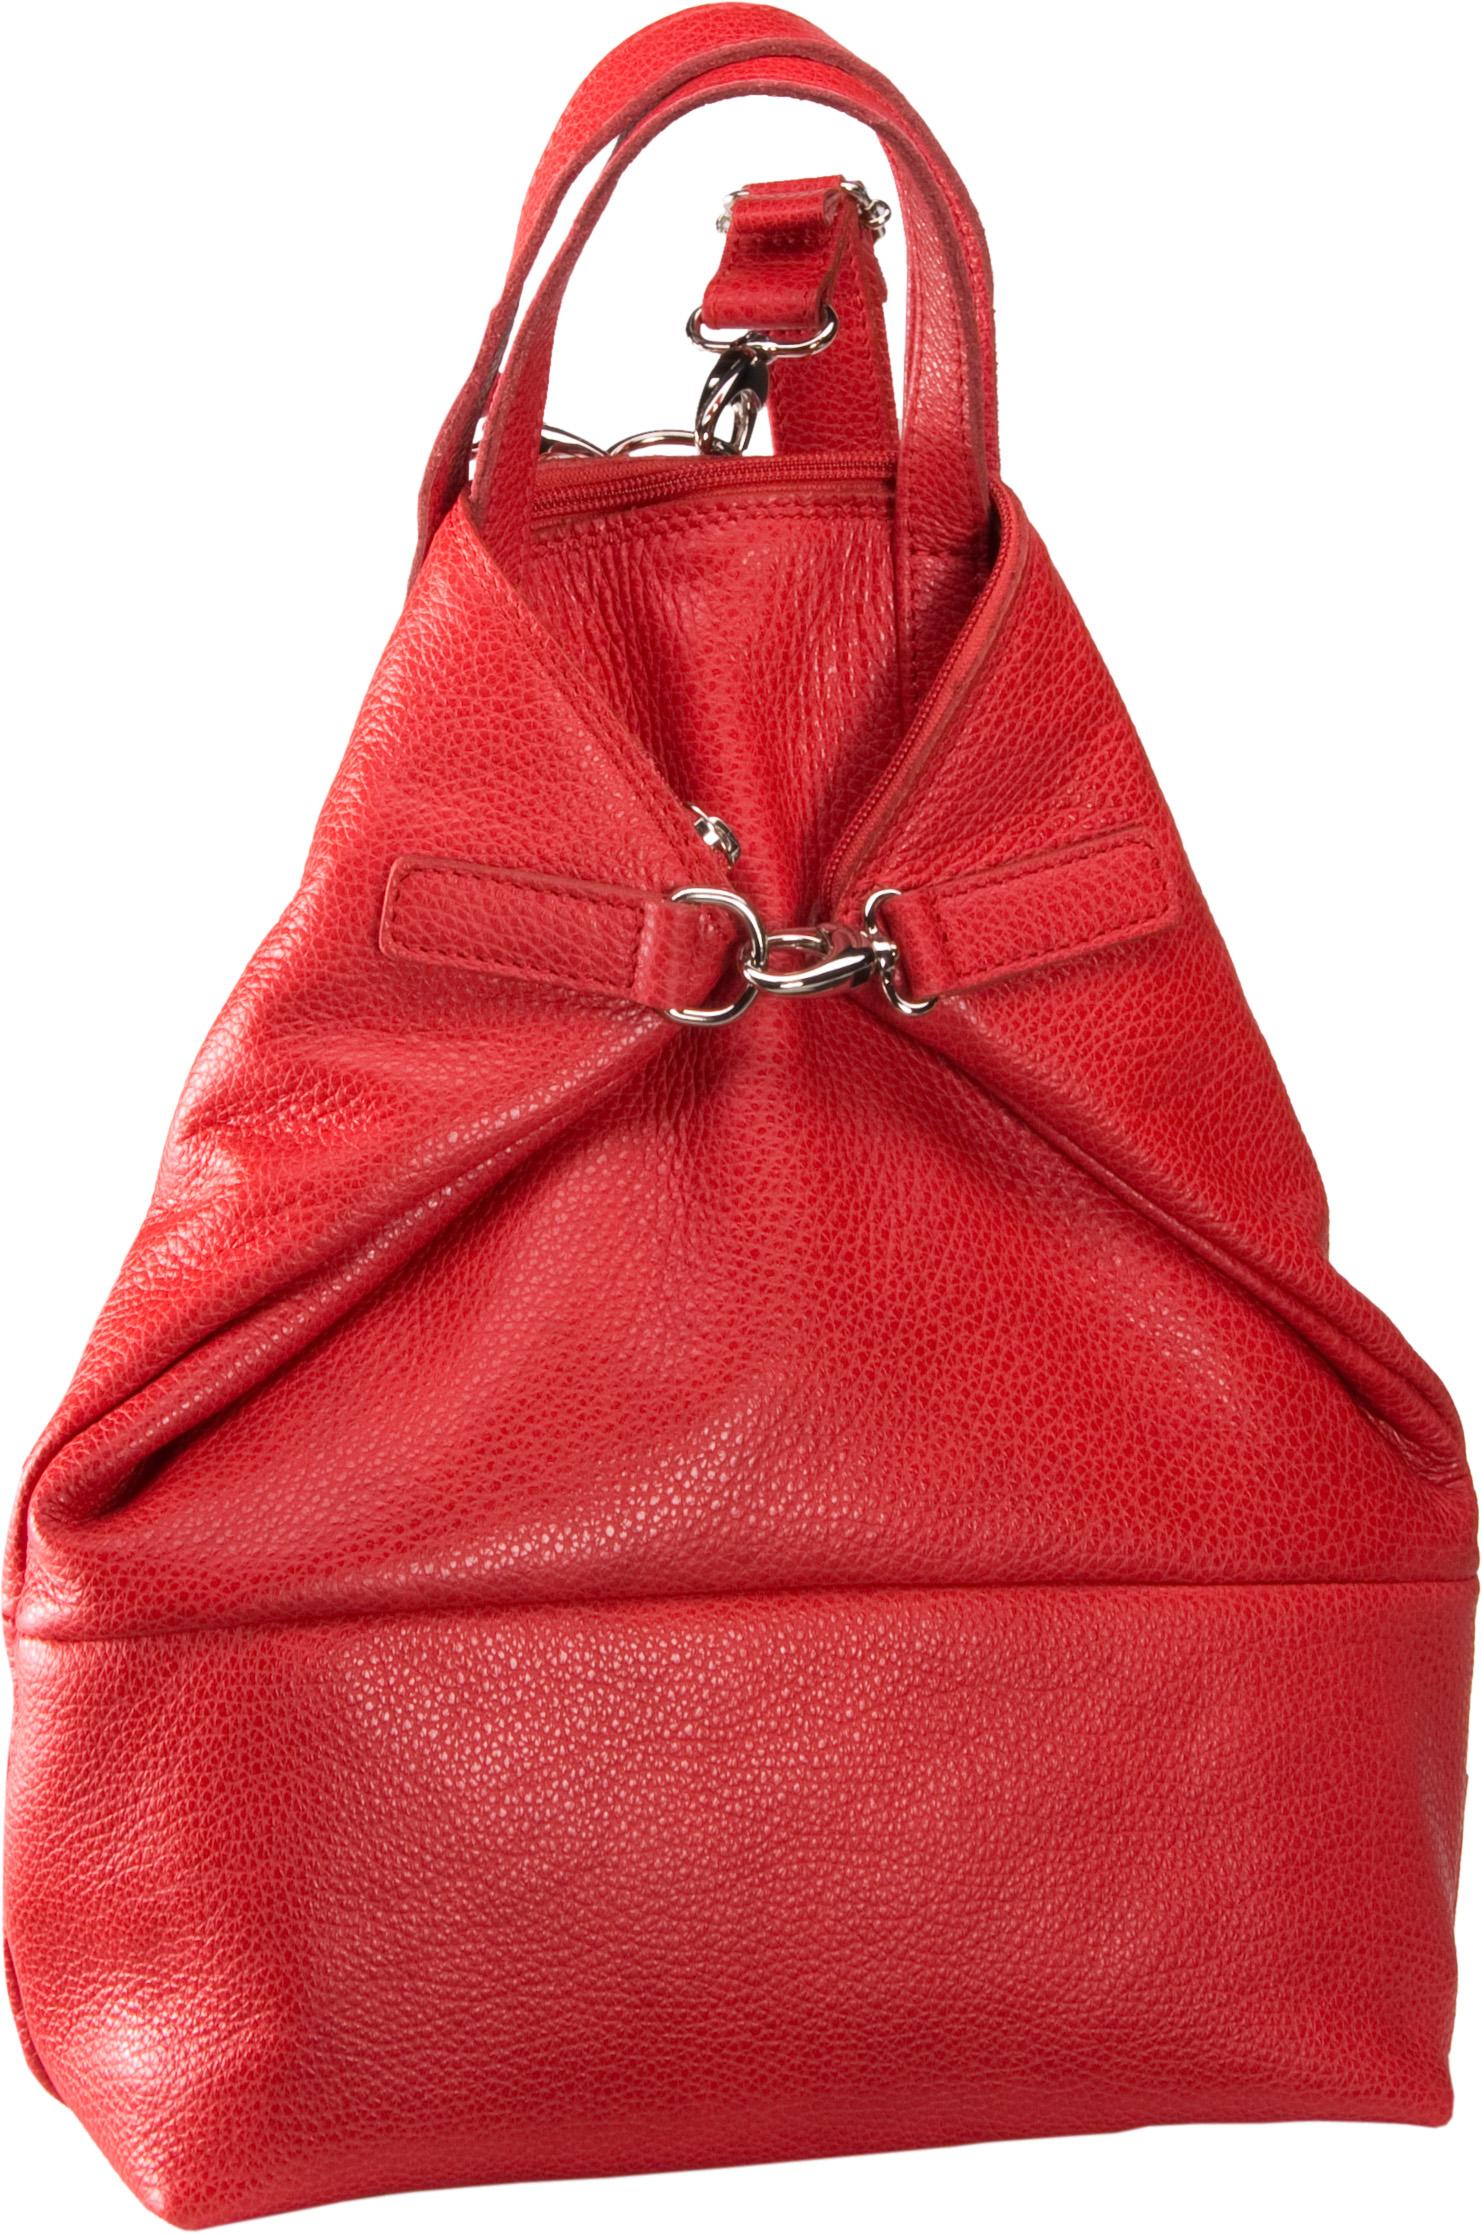 Rucksack / Daypack Vika 1910 X-Change 3in1 Bag S Red